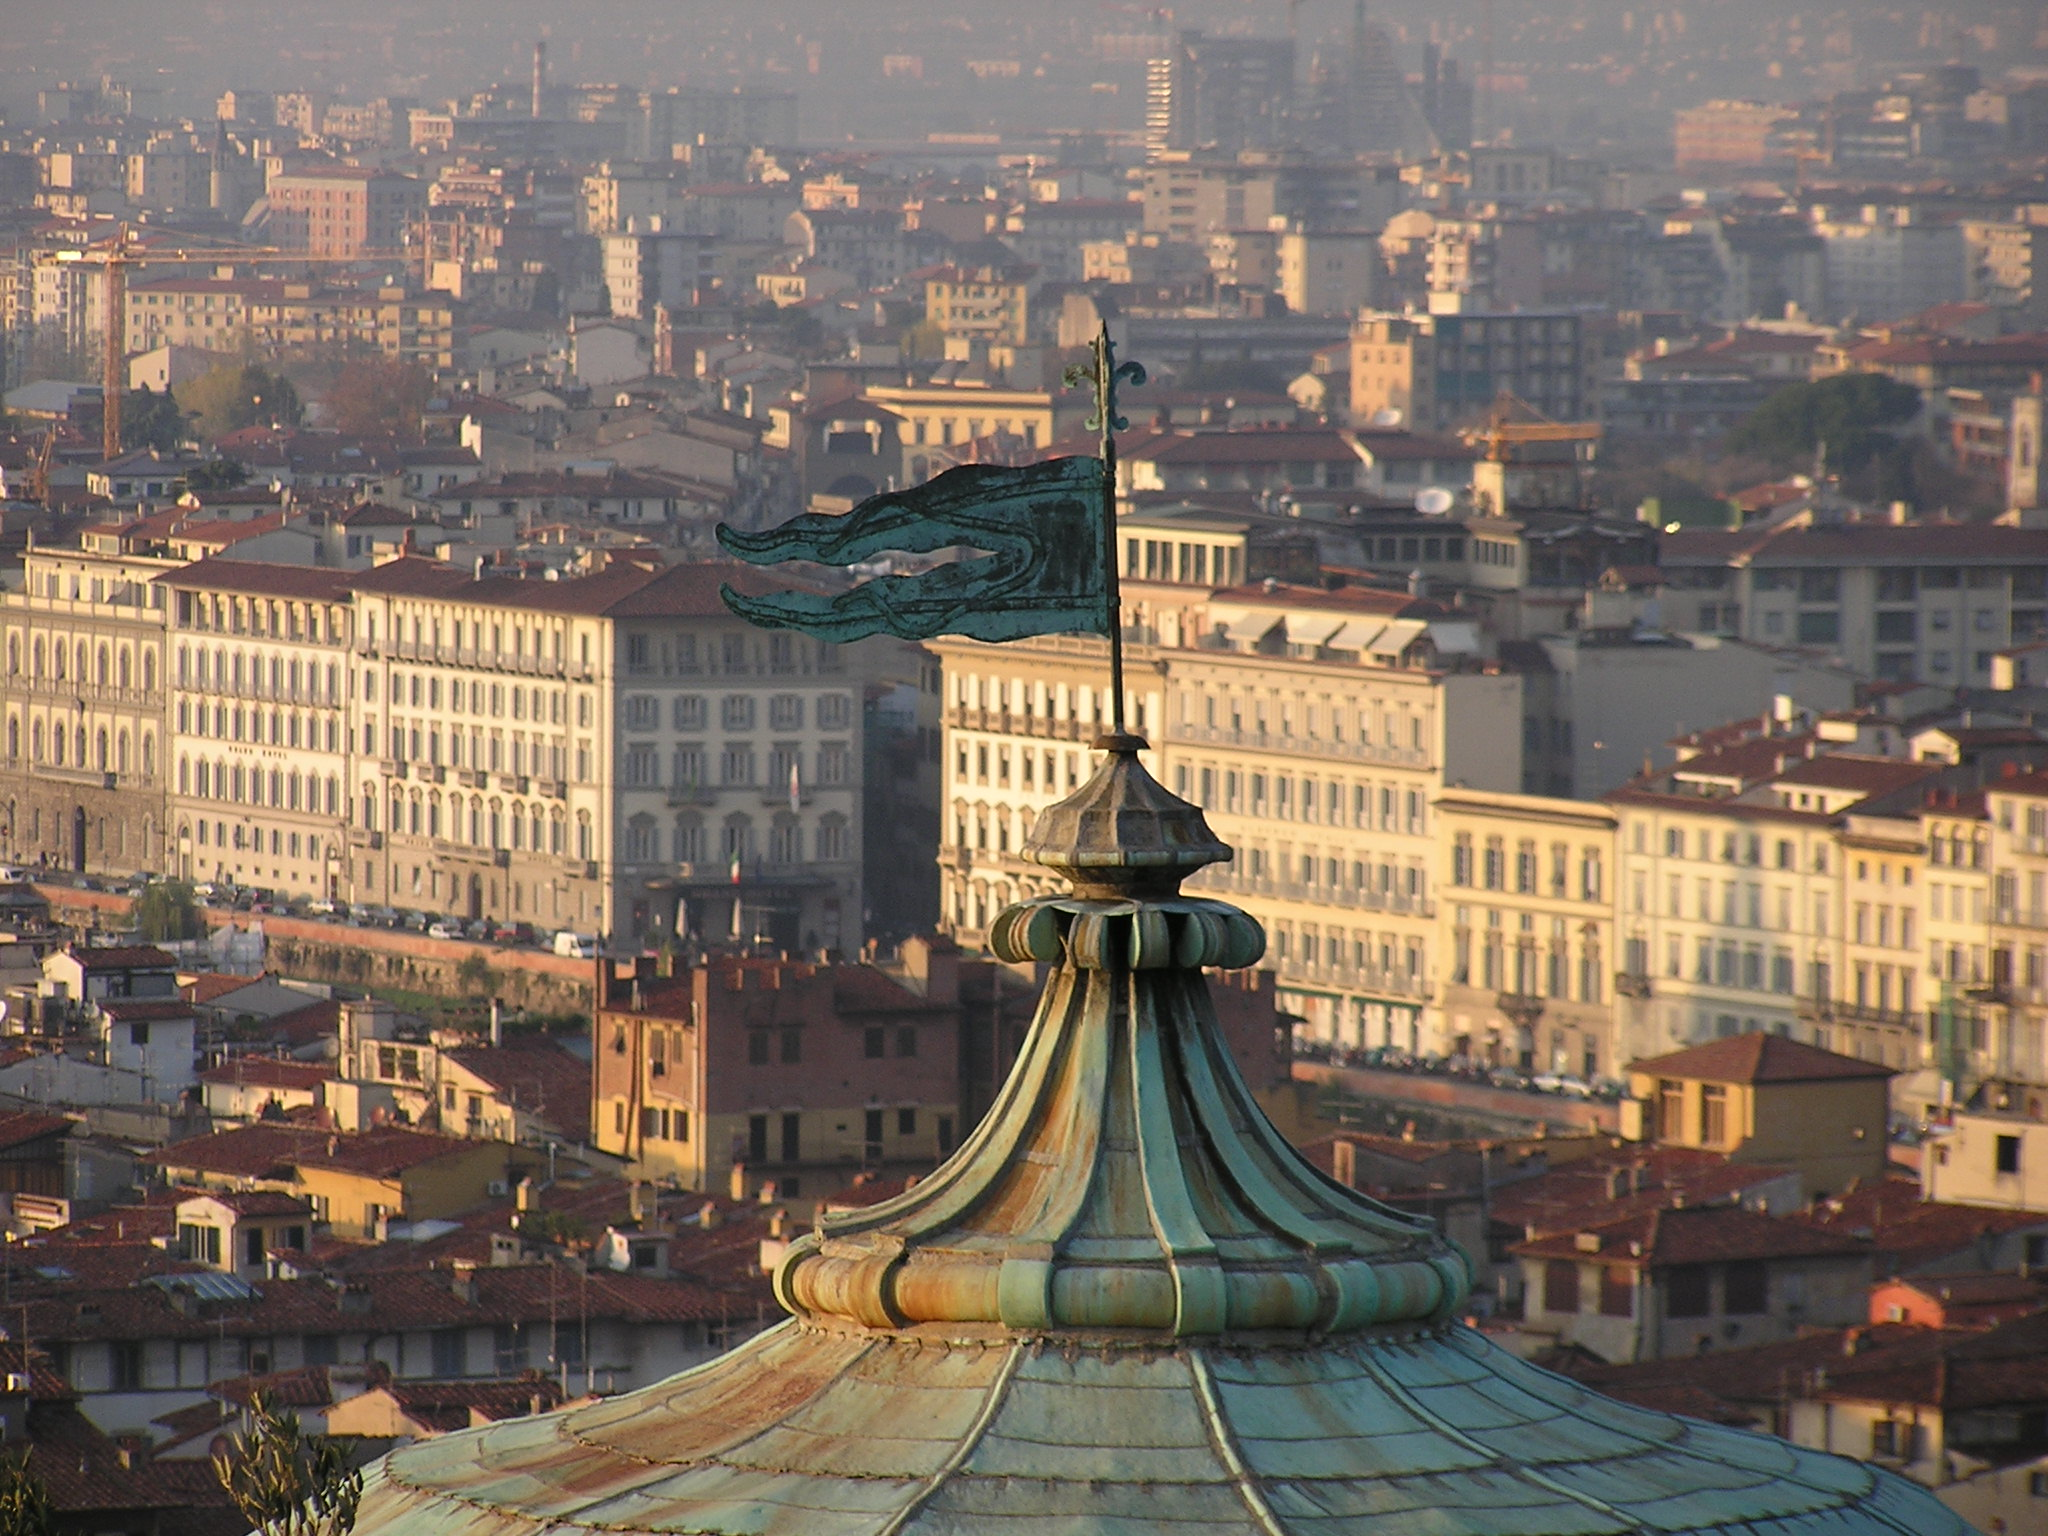 Florence is a big, sprawling city